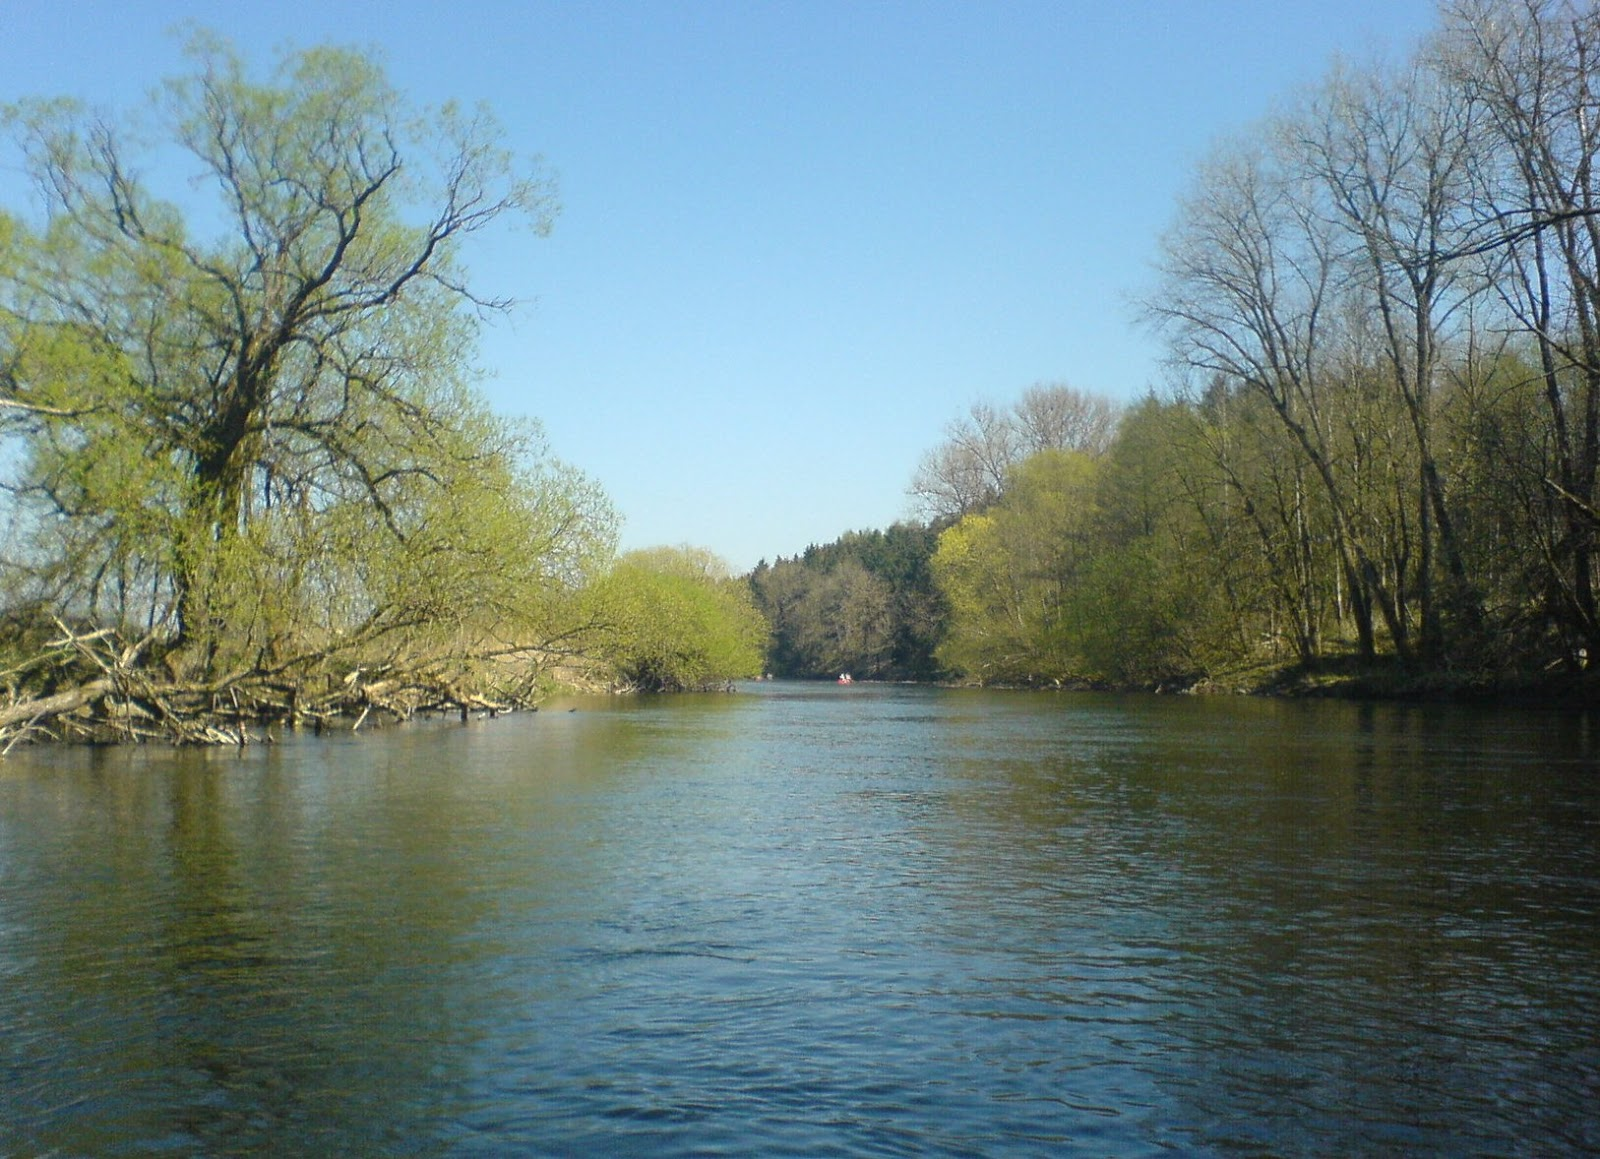 Mz Donau